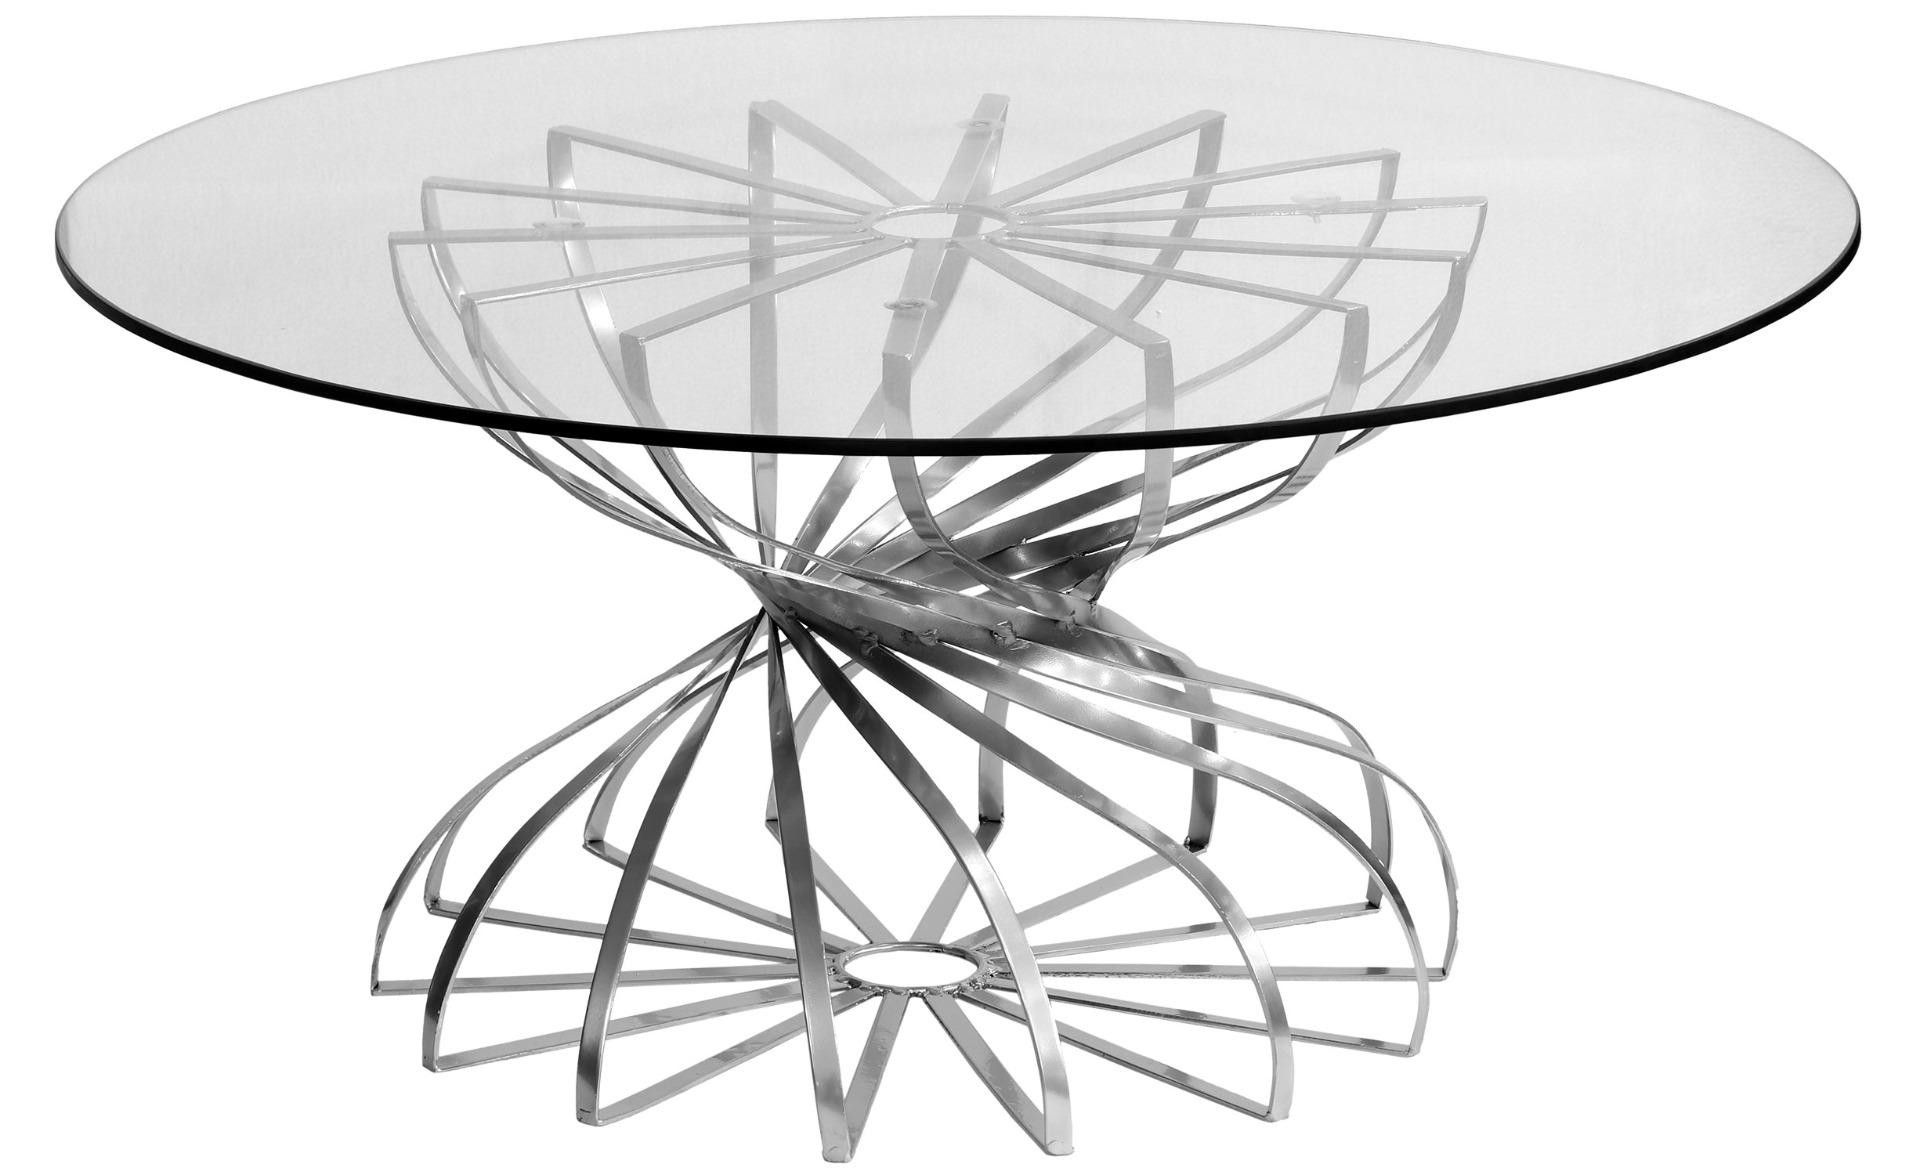 Table Basse ronde Tornado Nickel et Verre transparent